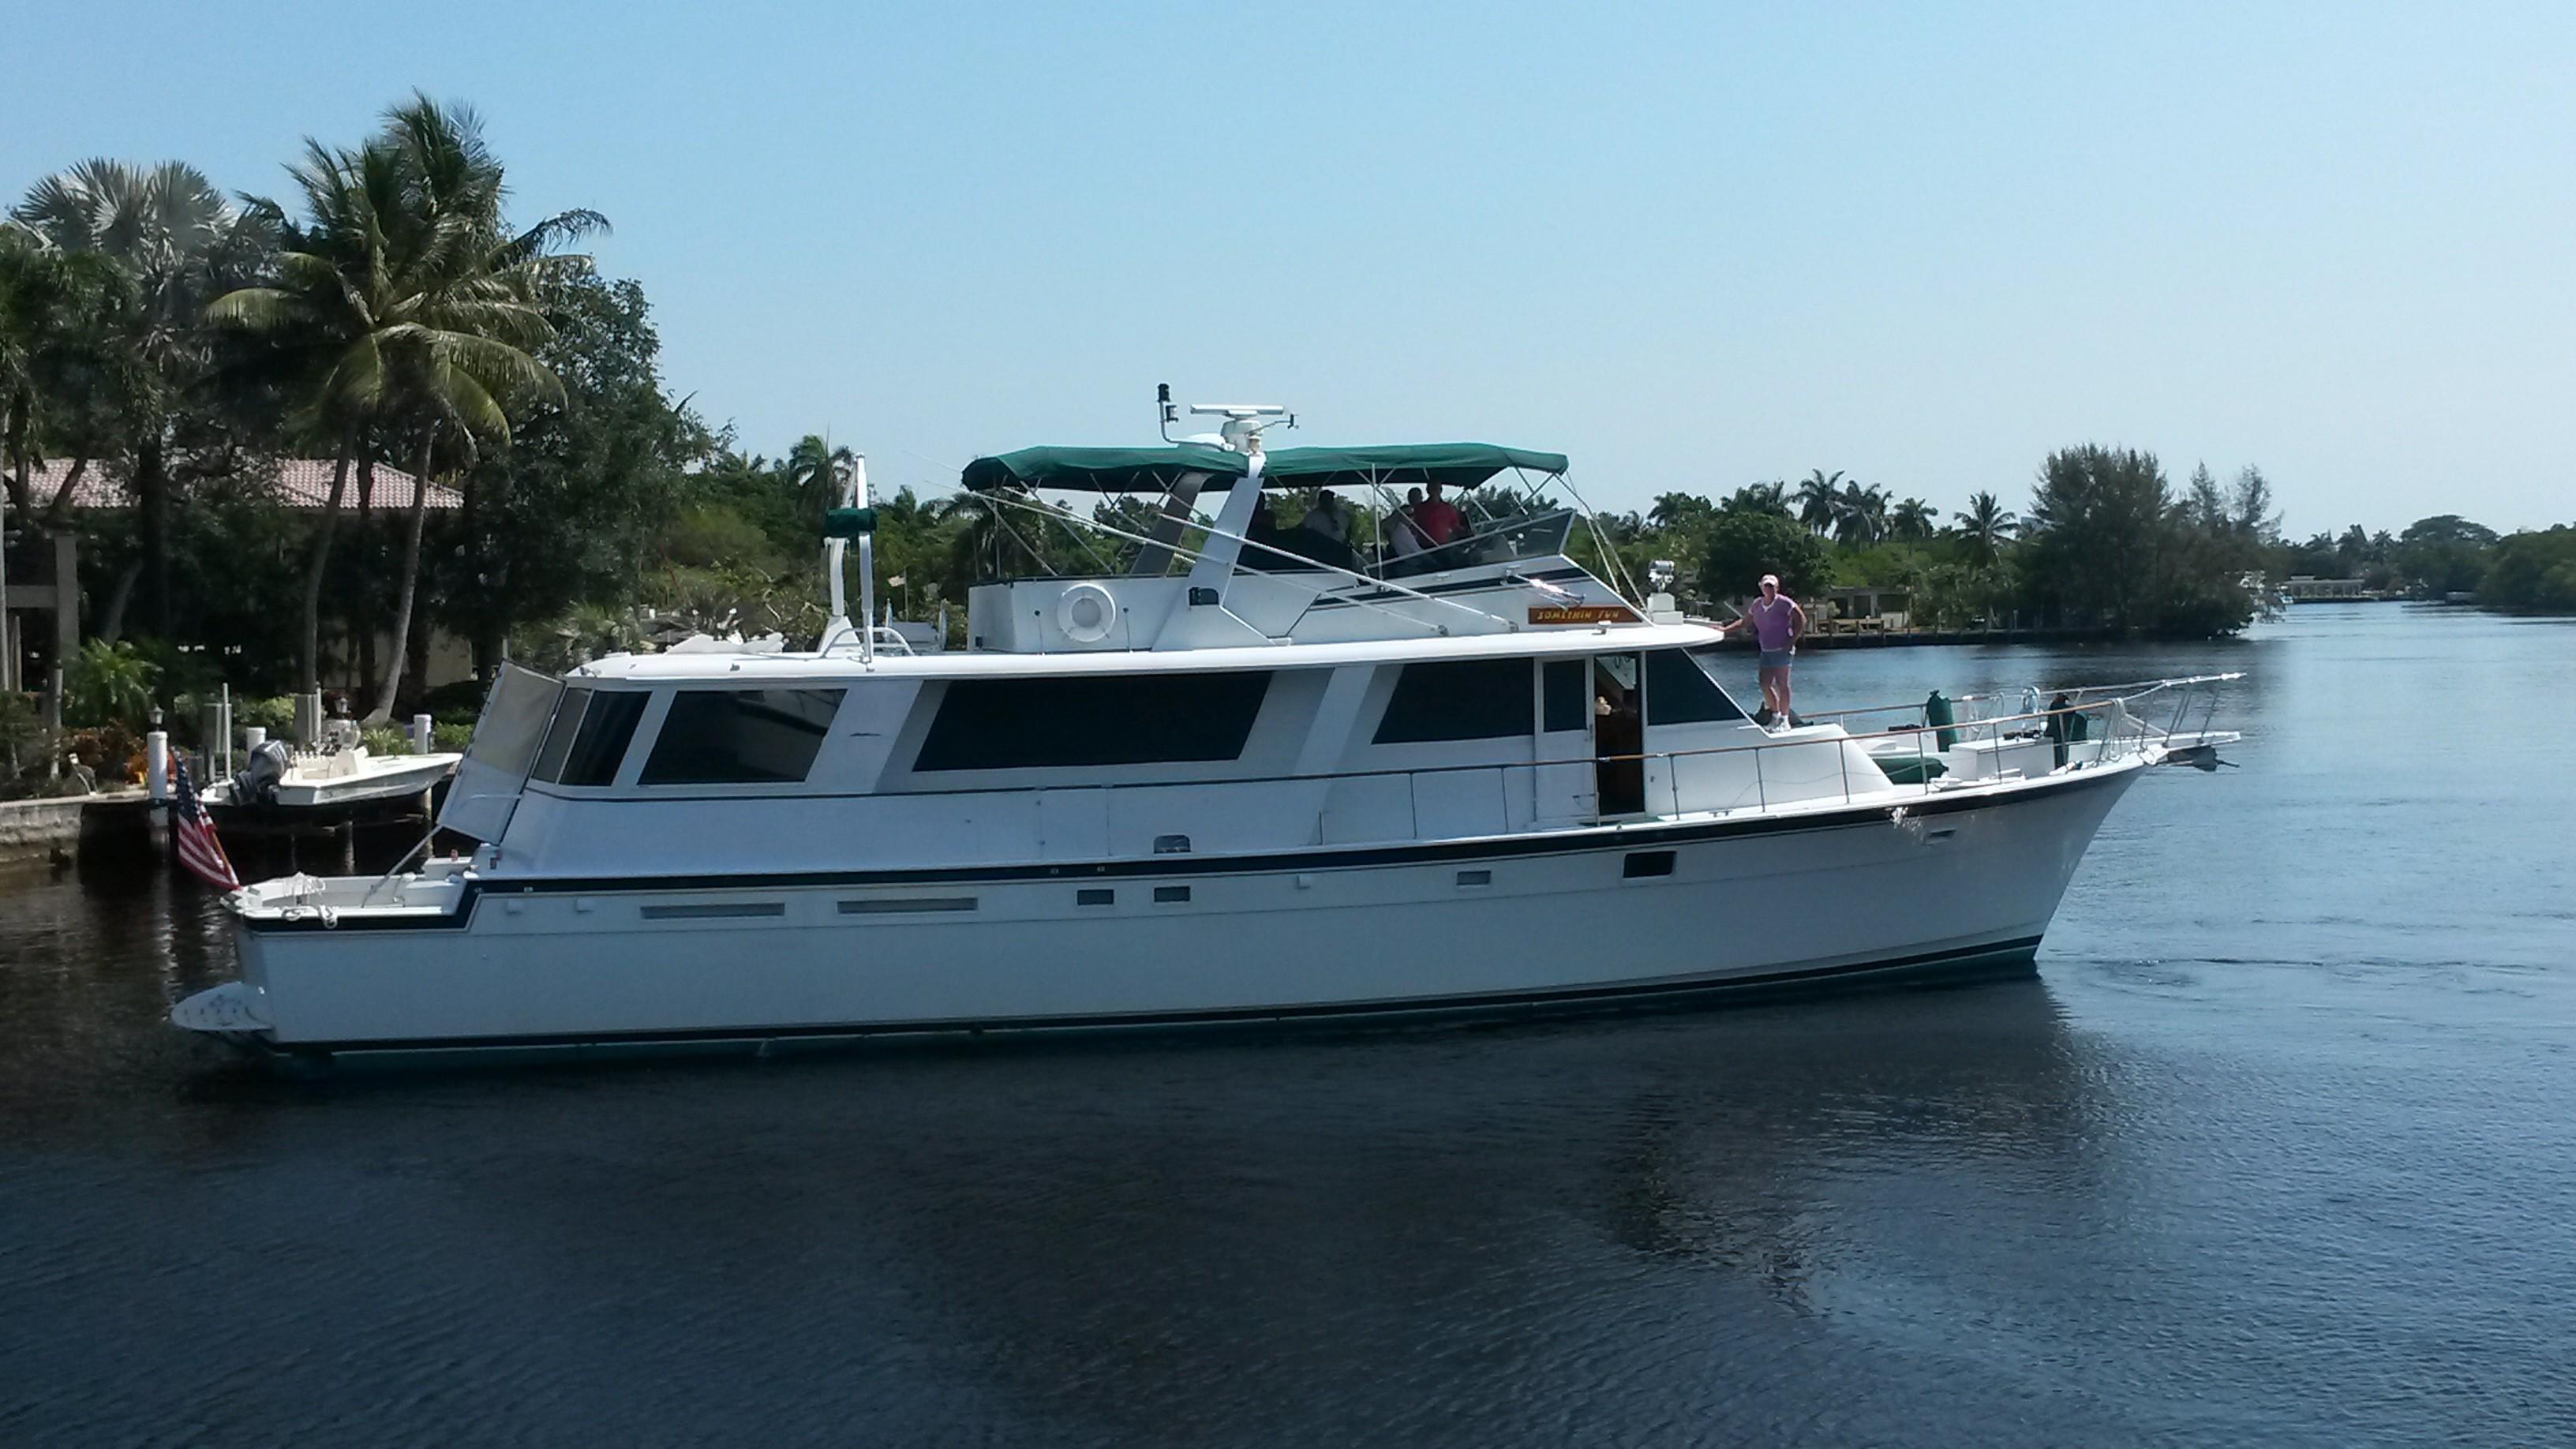 72' Hatteras Motor Yacht SOMETHIN FUN